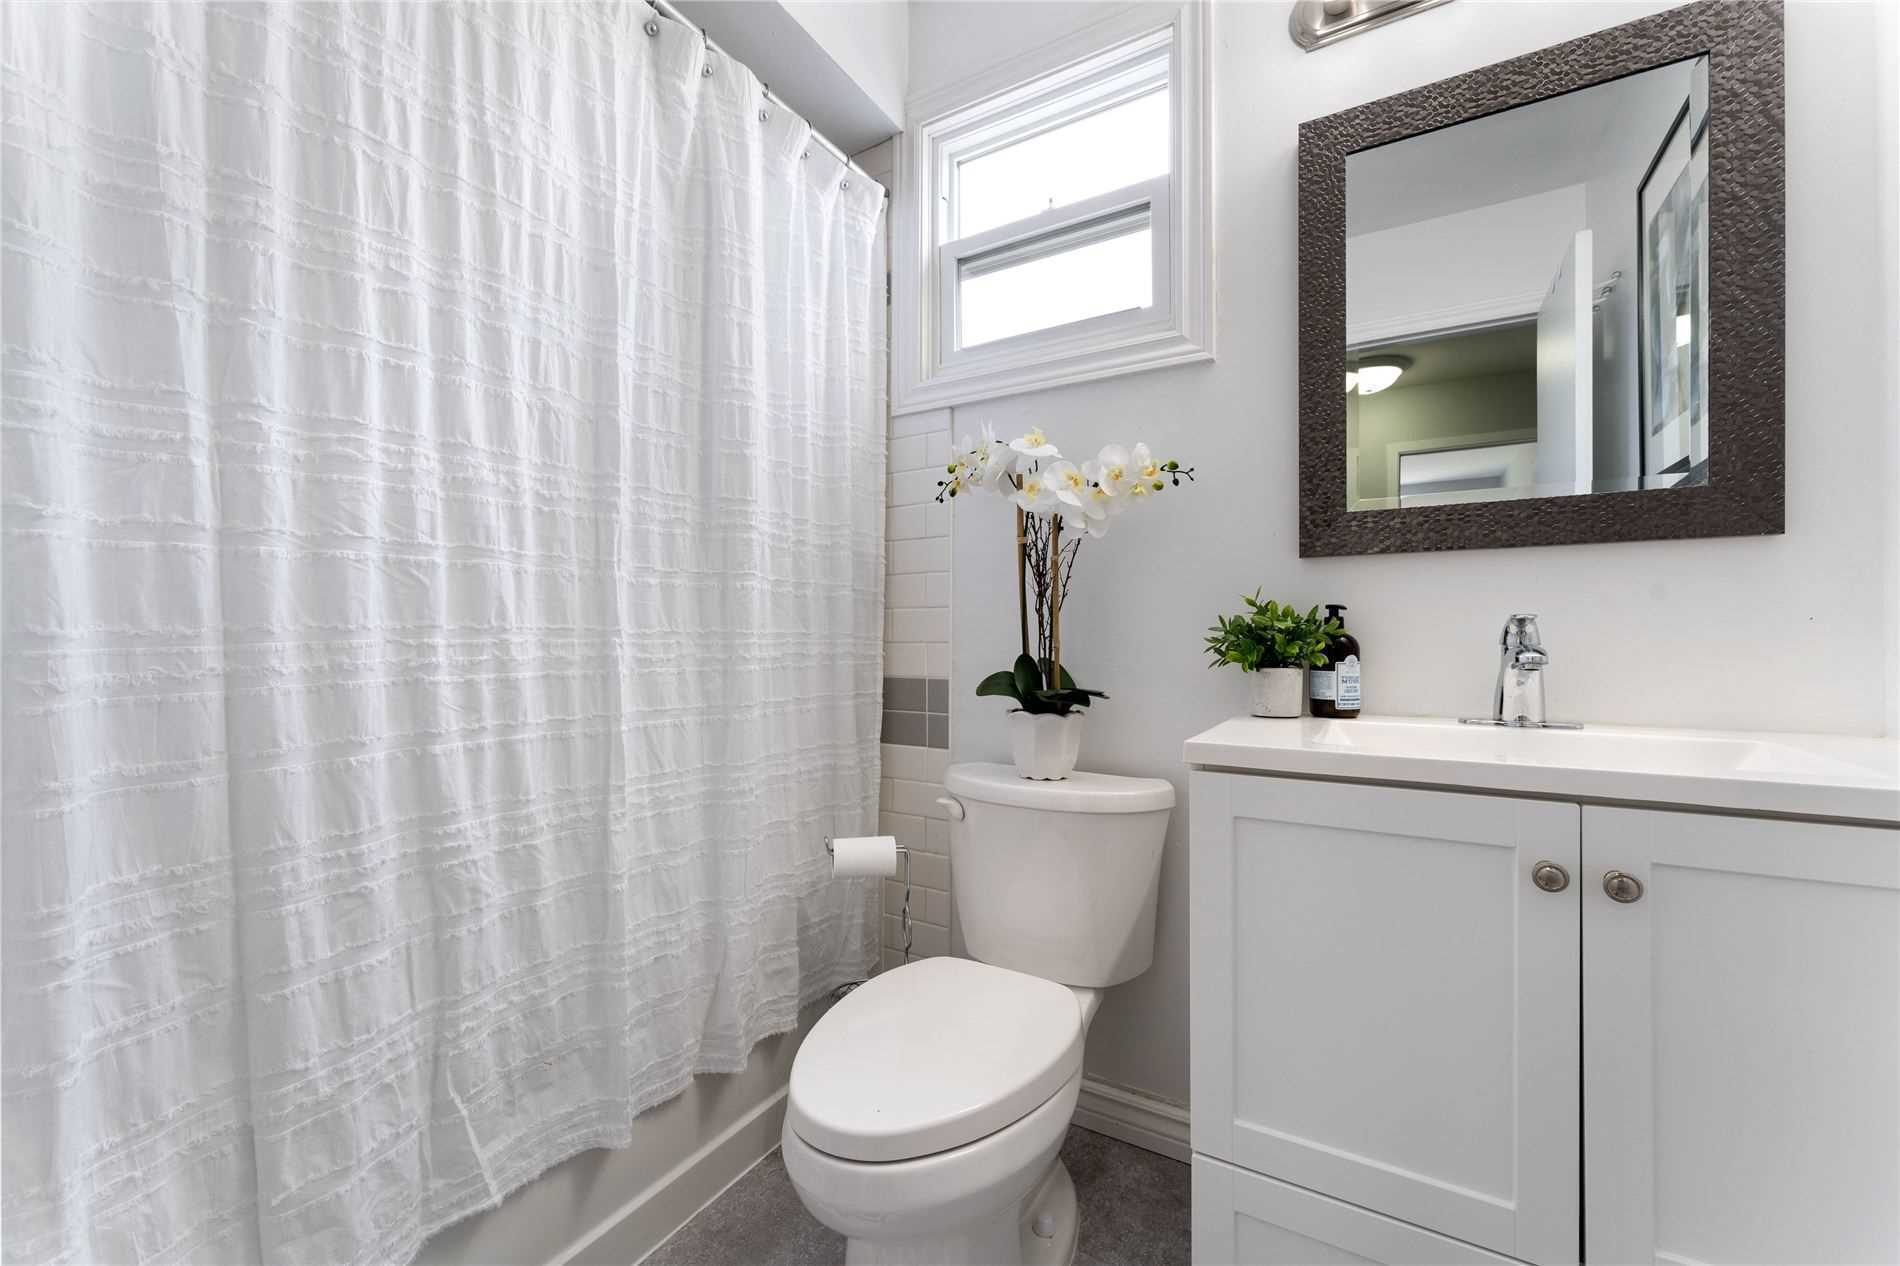 58 Woodlawn Ave, Brantford, Ontario N3V 1B1, 3 Bedrooms Bedrooms, 9 Rooms Rooms,1 BathroomBathrooms,Detached,For Sale,Woodlawn,X5349164